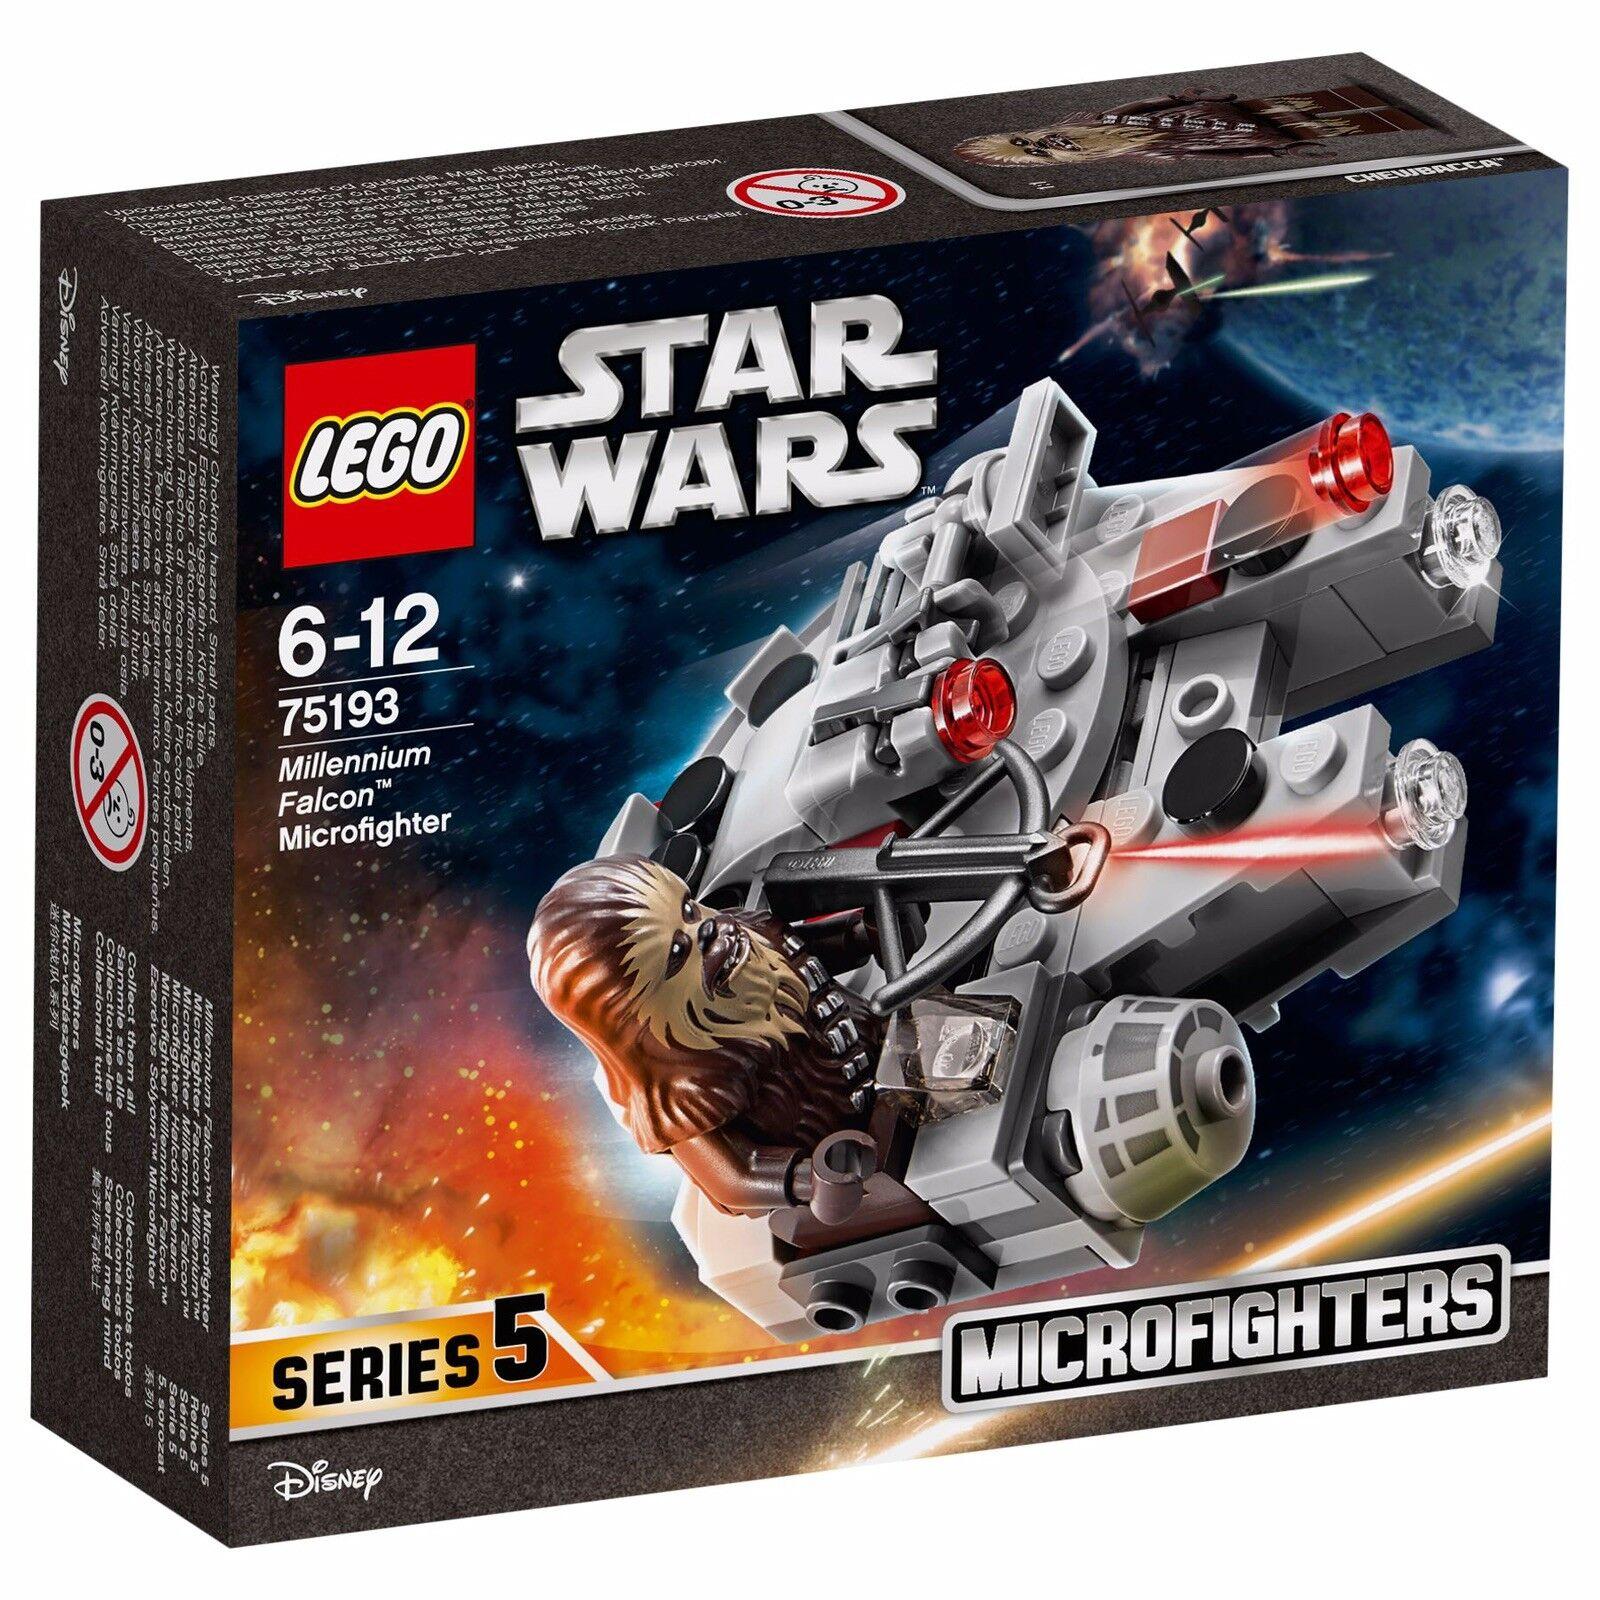 Lego star wars 75193 Millenium Falcon Microfighter NEW